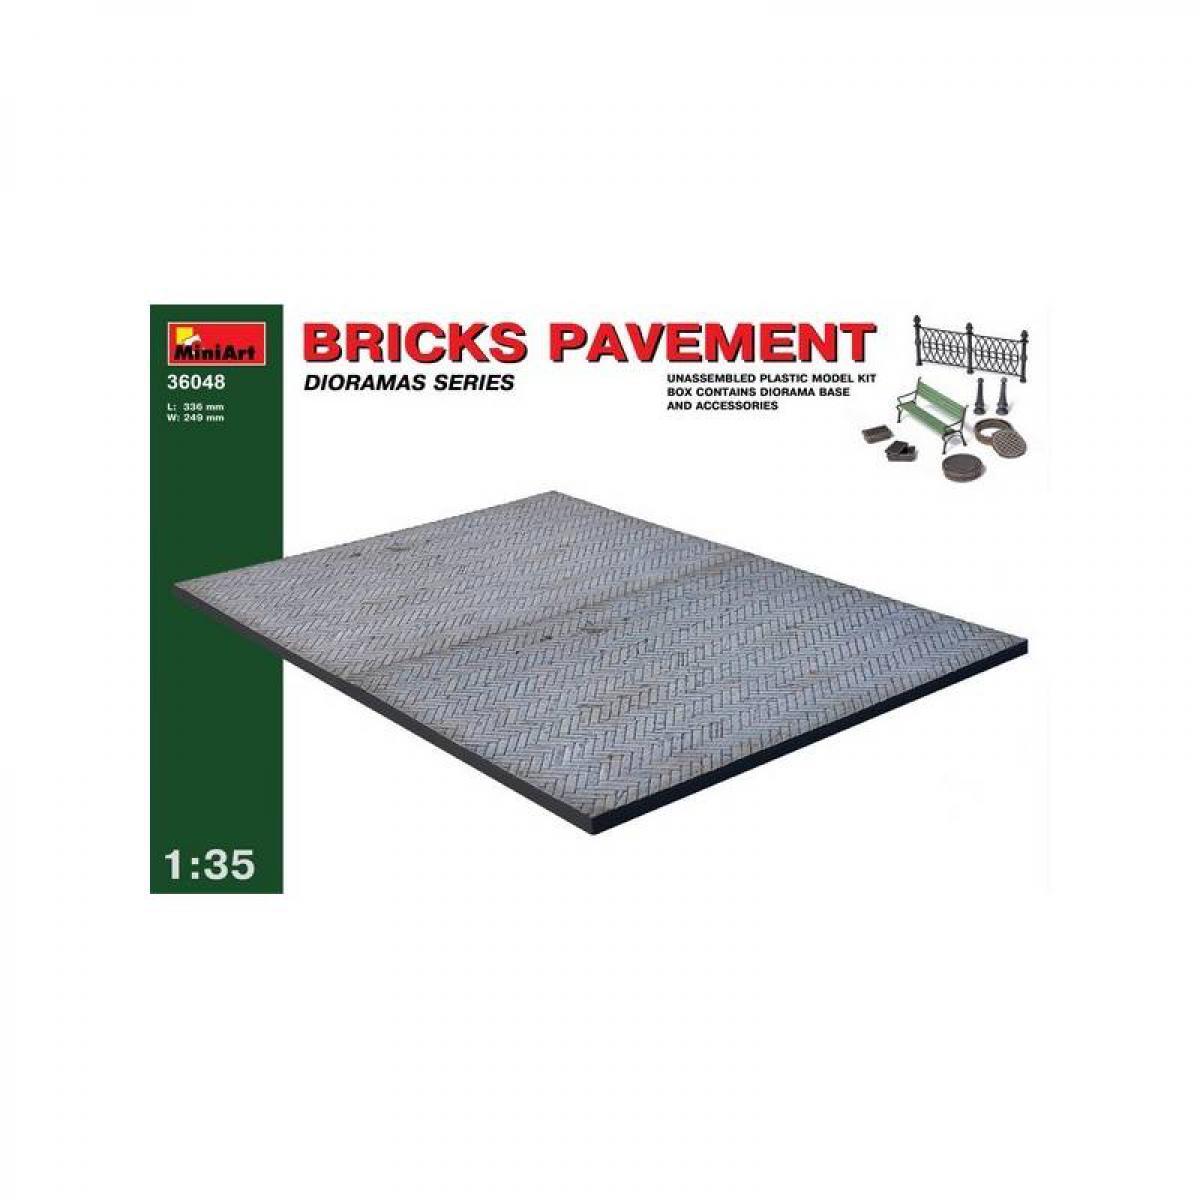 Mini Art Bricks Pavement - Décor Modélisme